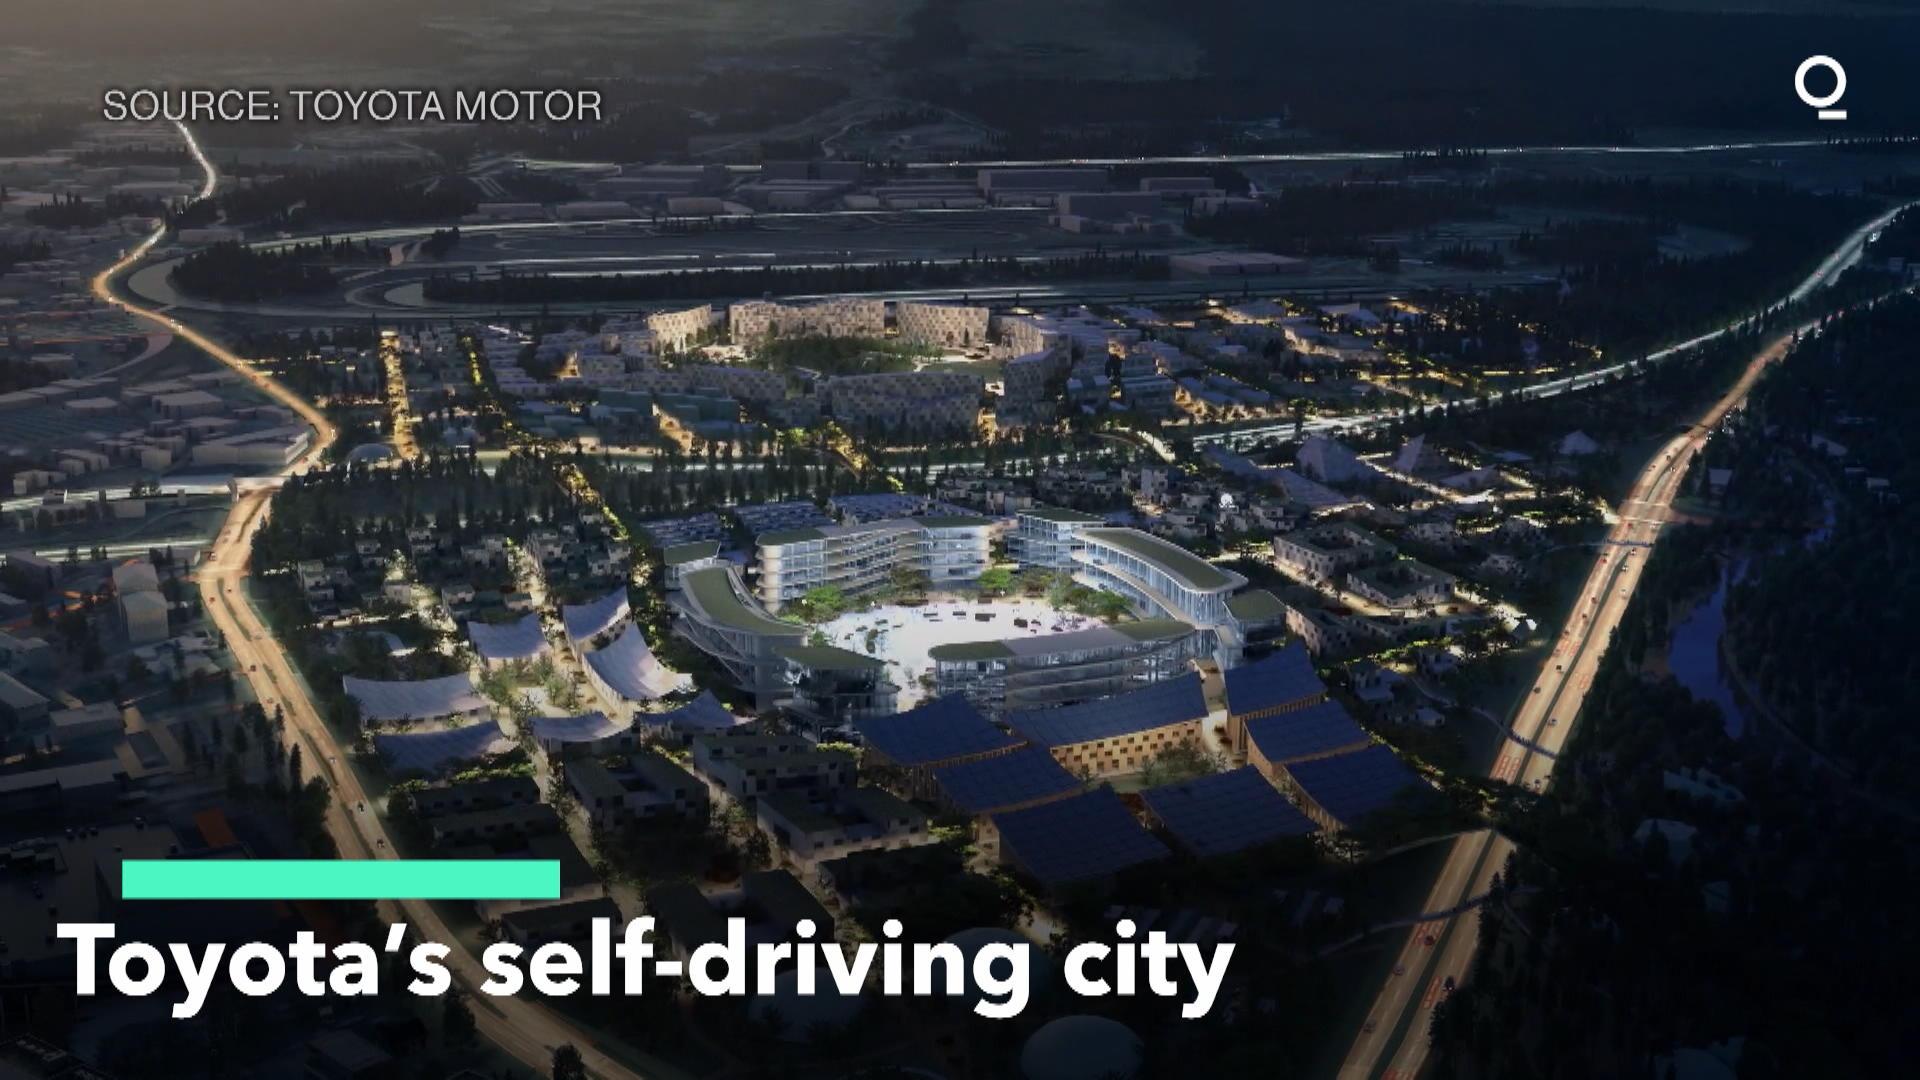 Toyota's Self-Driving City